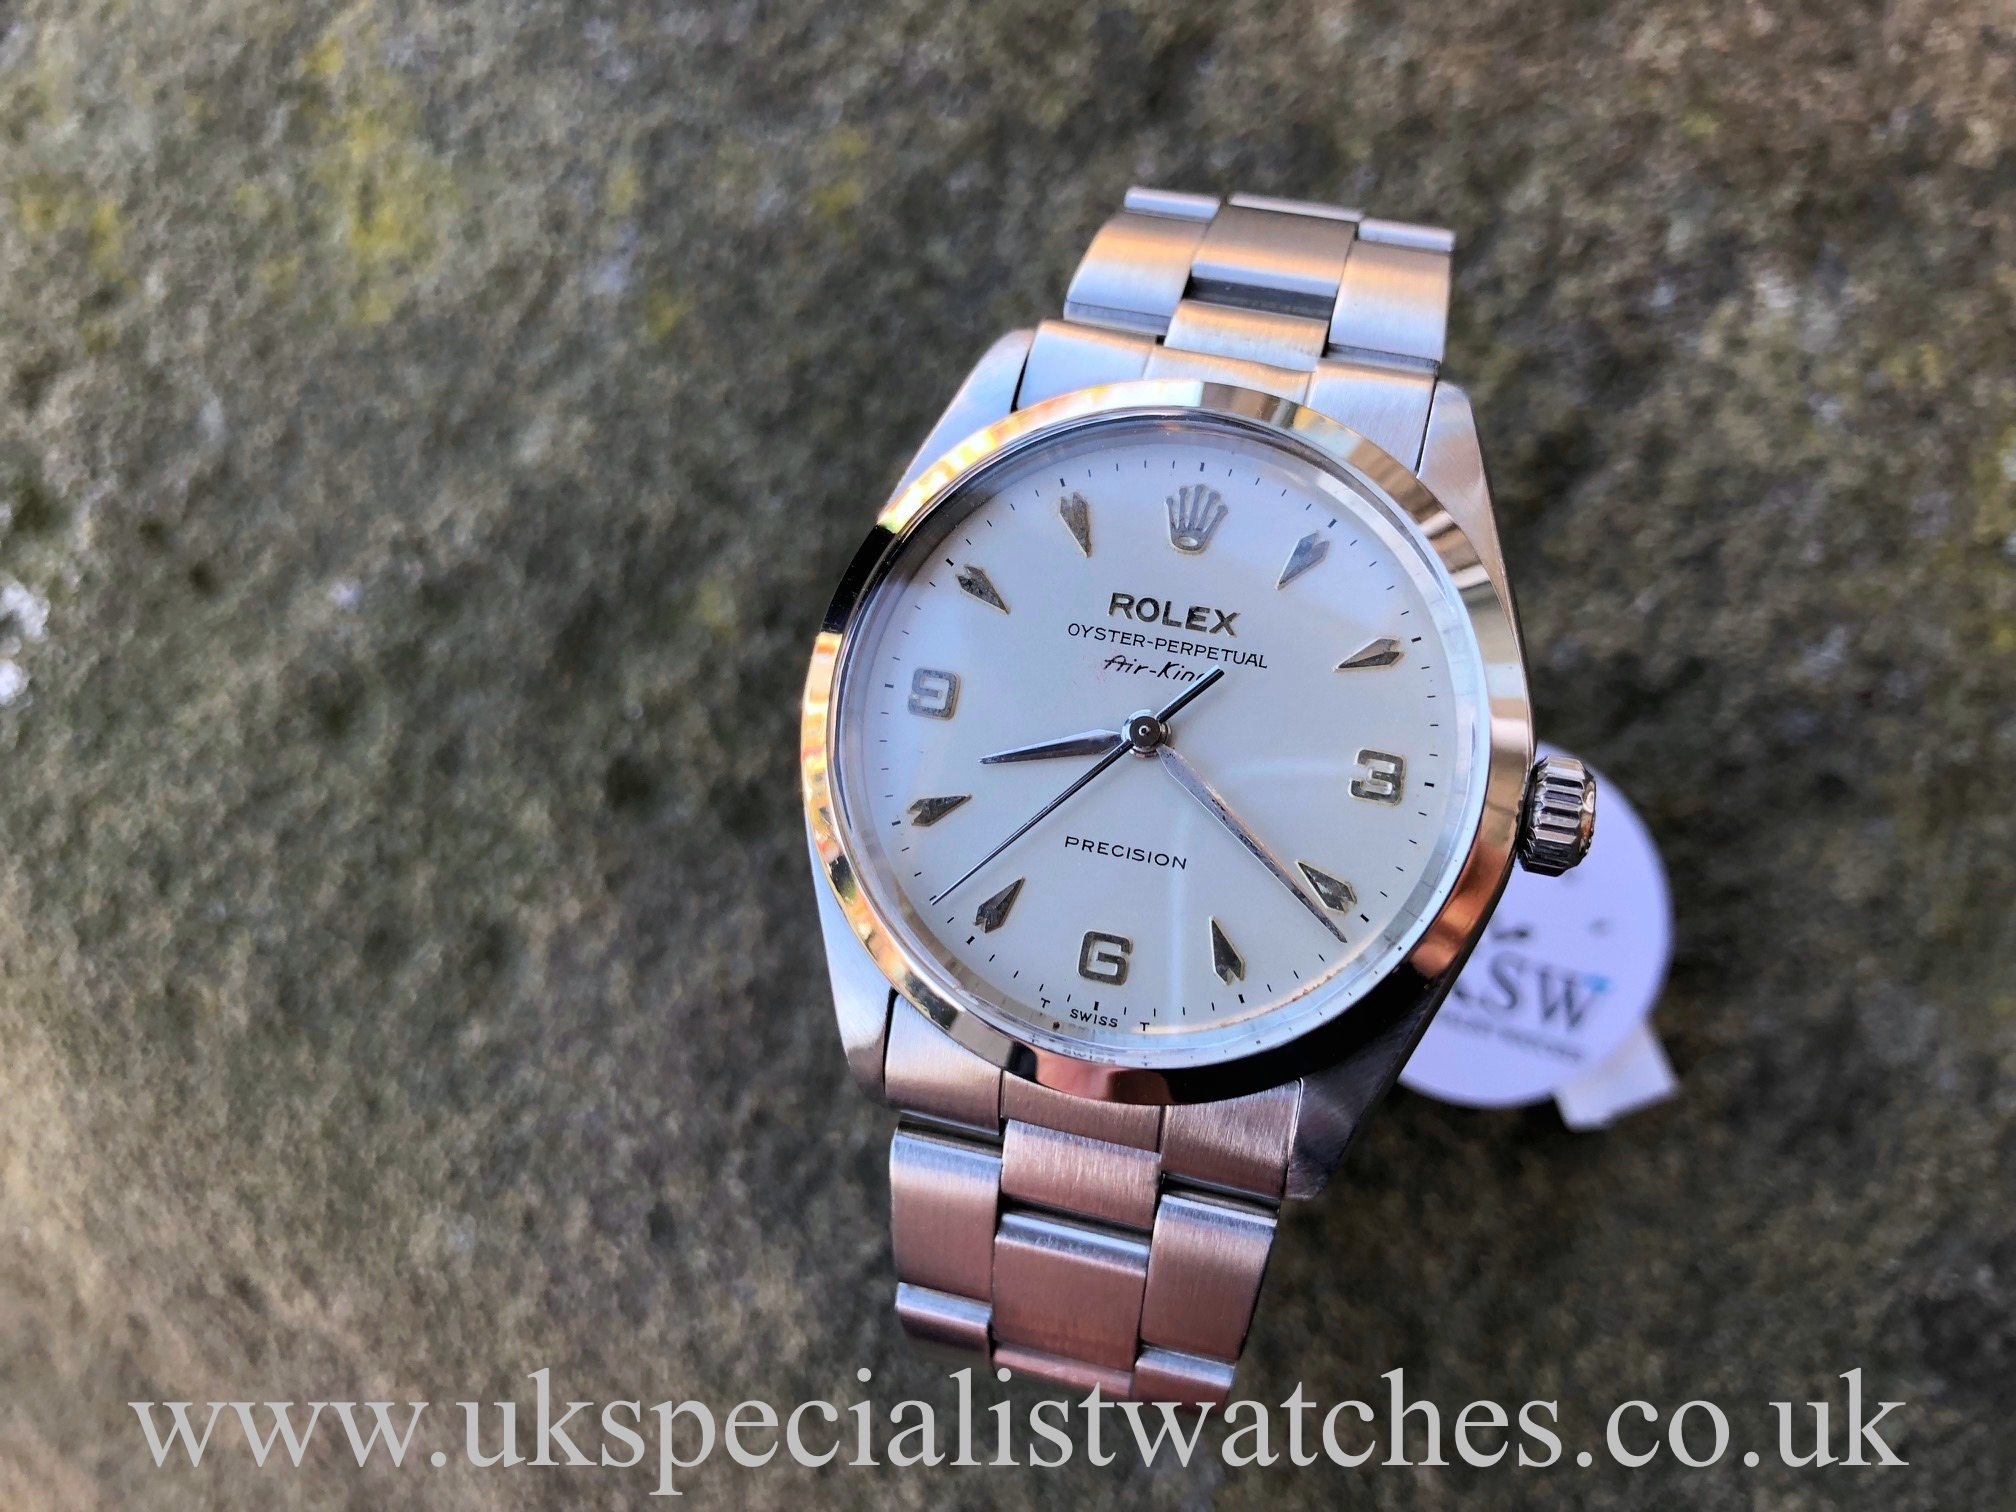 Ladies Rolex Watches Uk >> Rolex Air King 5500 3-6-9 – Arrow Head Dial – Vintage 1968 – UK Specialist Watches